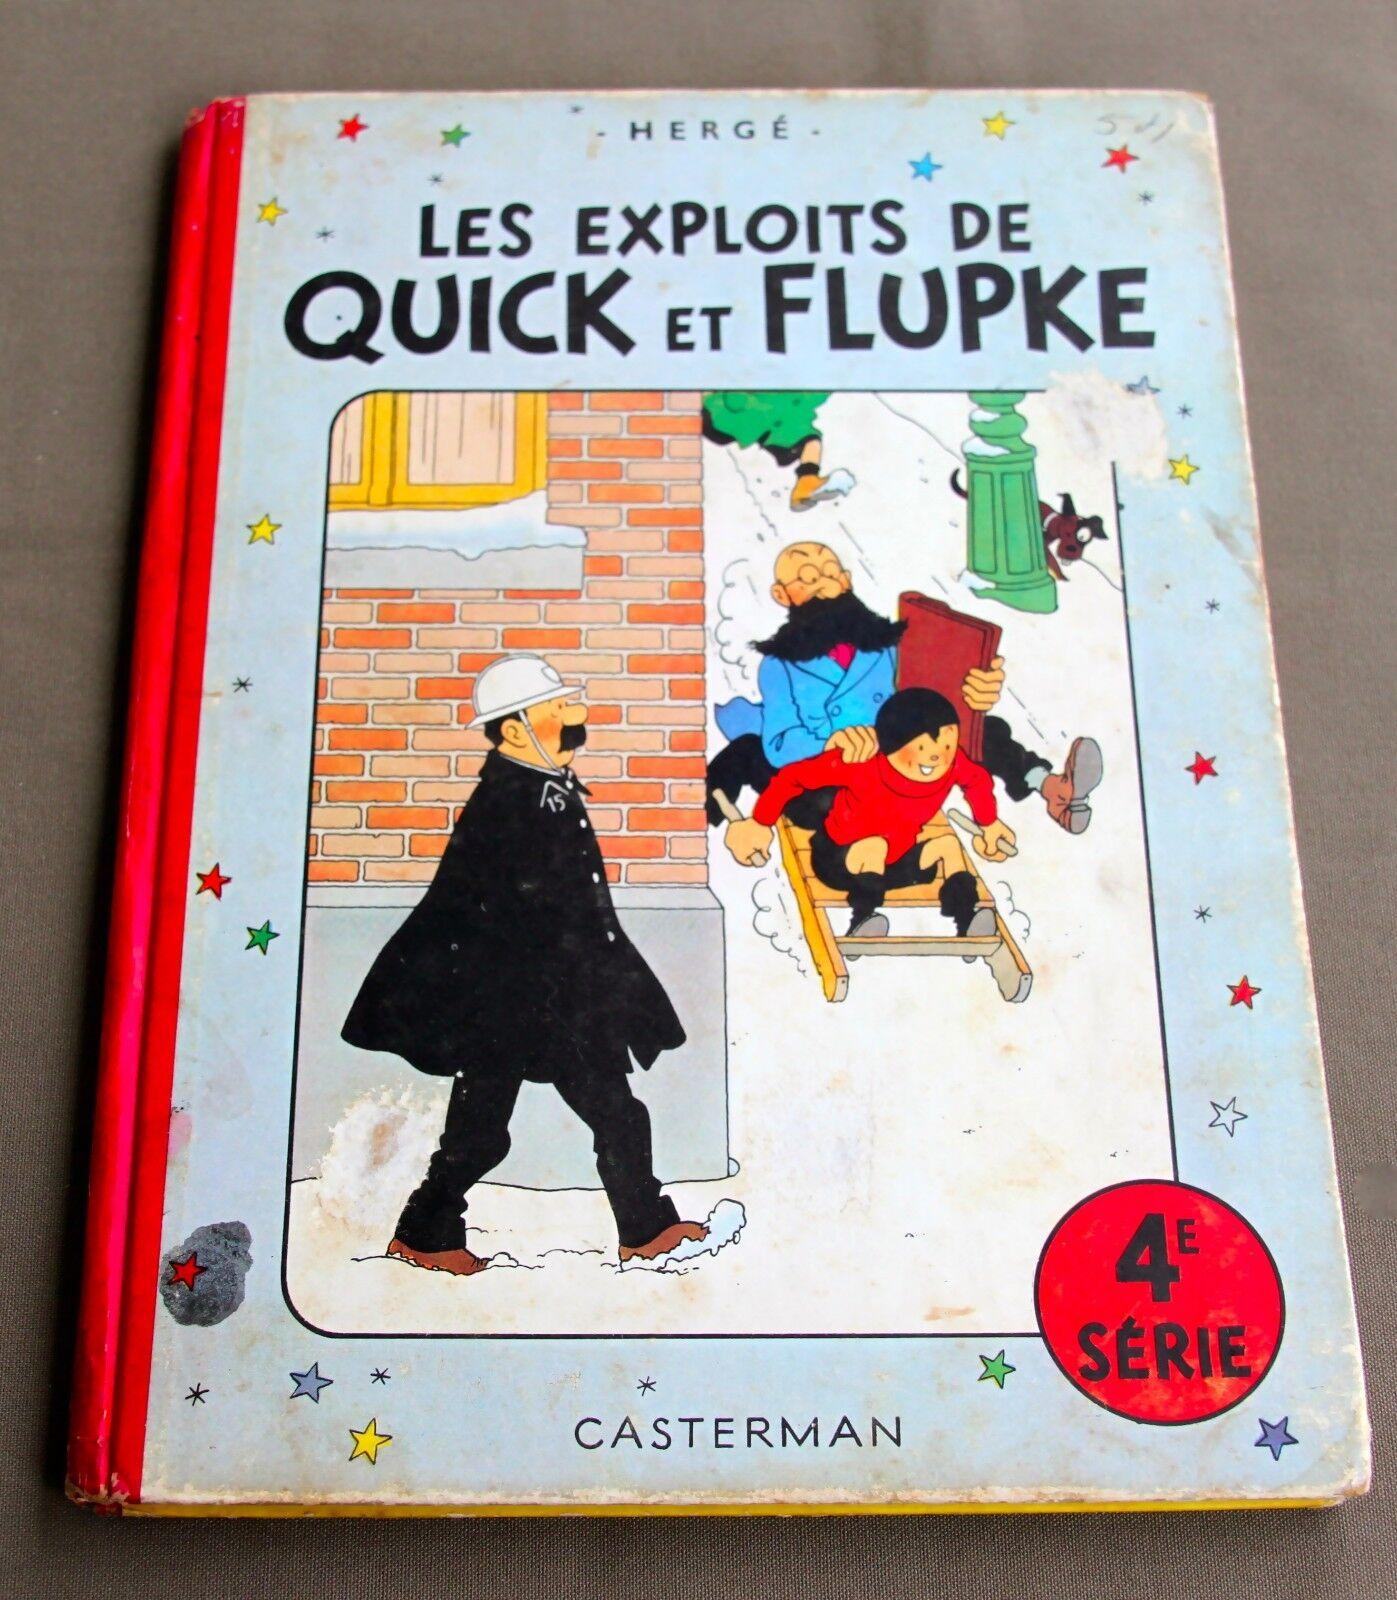 HERGE - LES EXPLOITS DE  QUICK ET  FLUPKE  4E SERIE - 1954 - B10